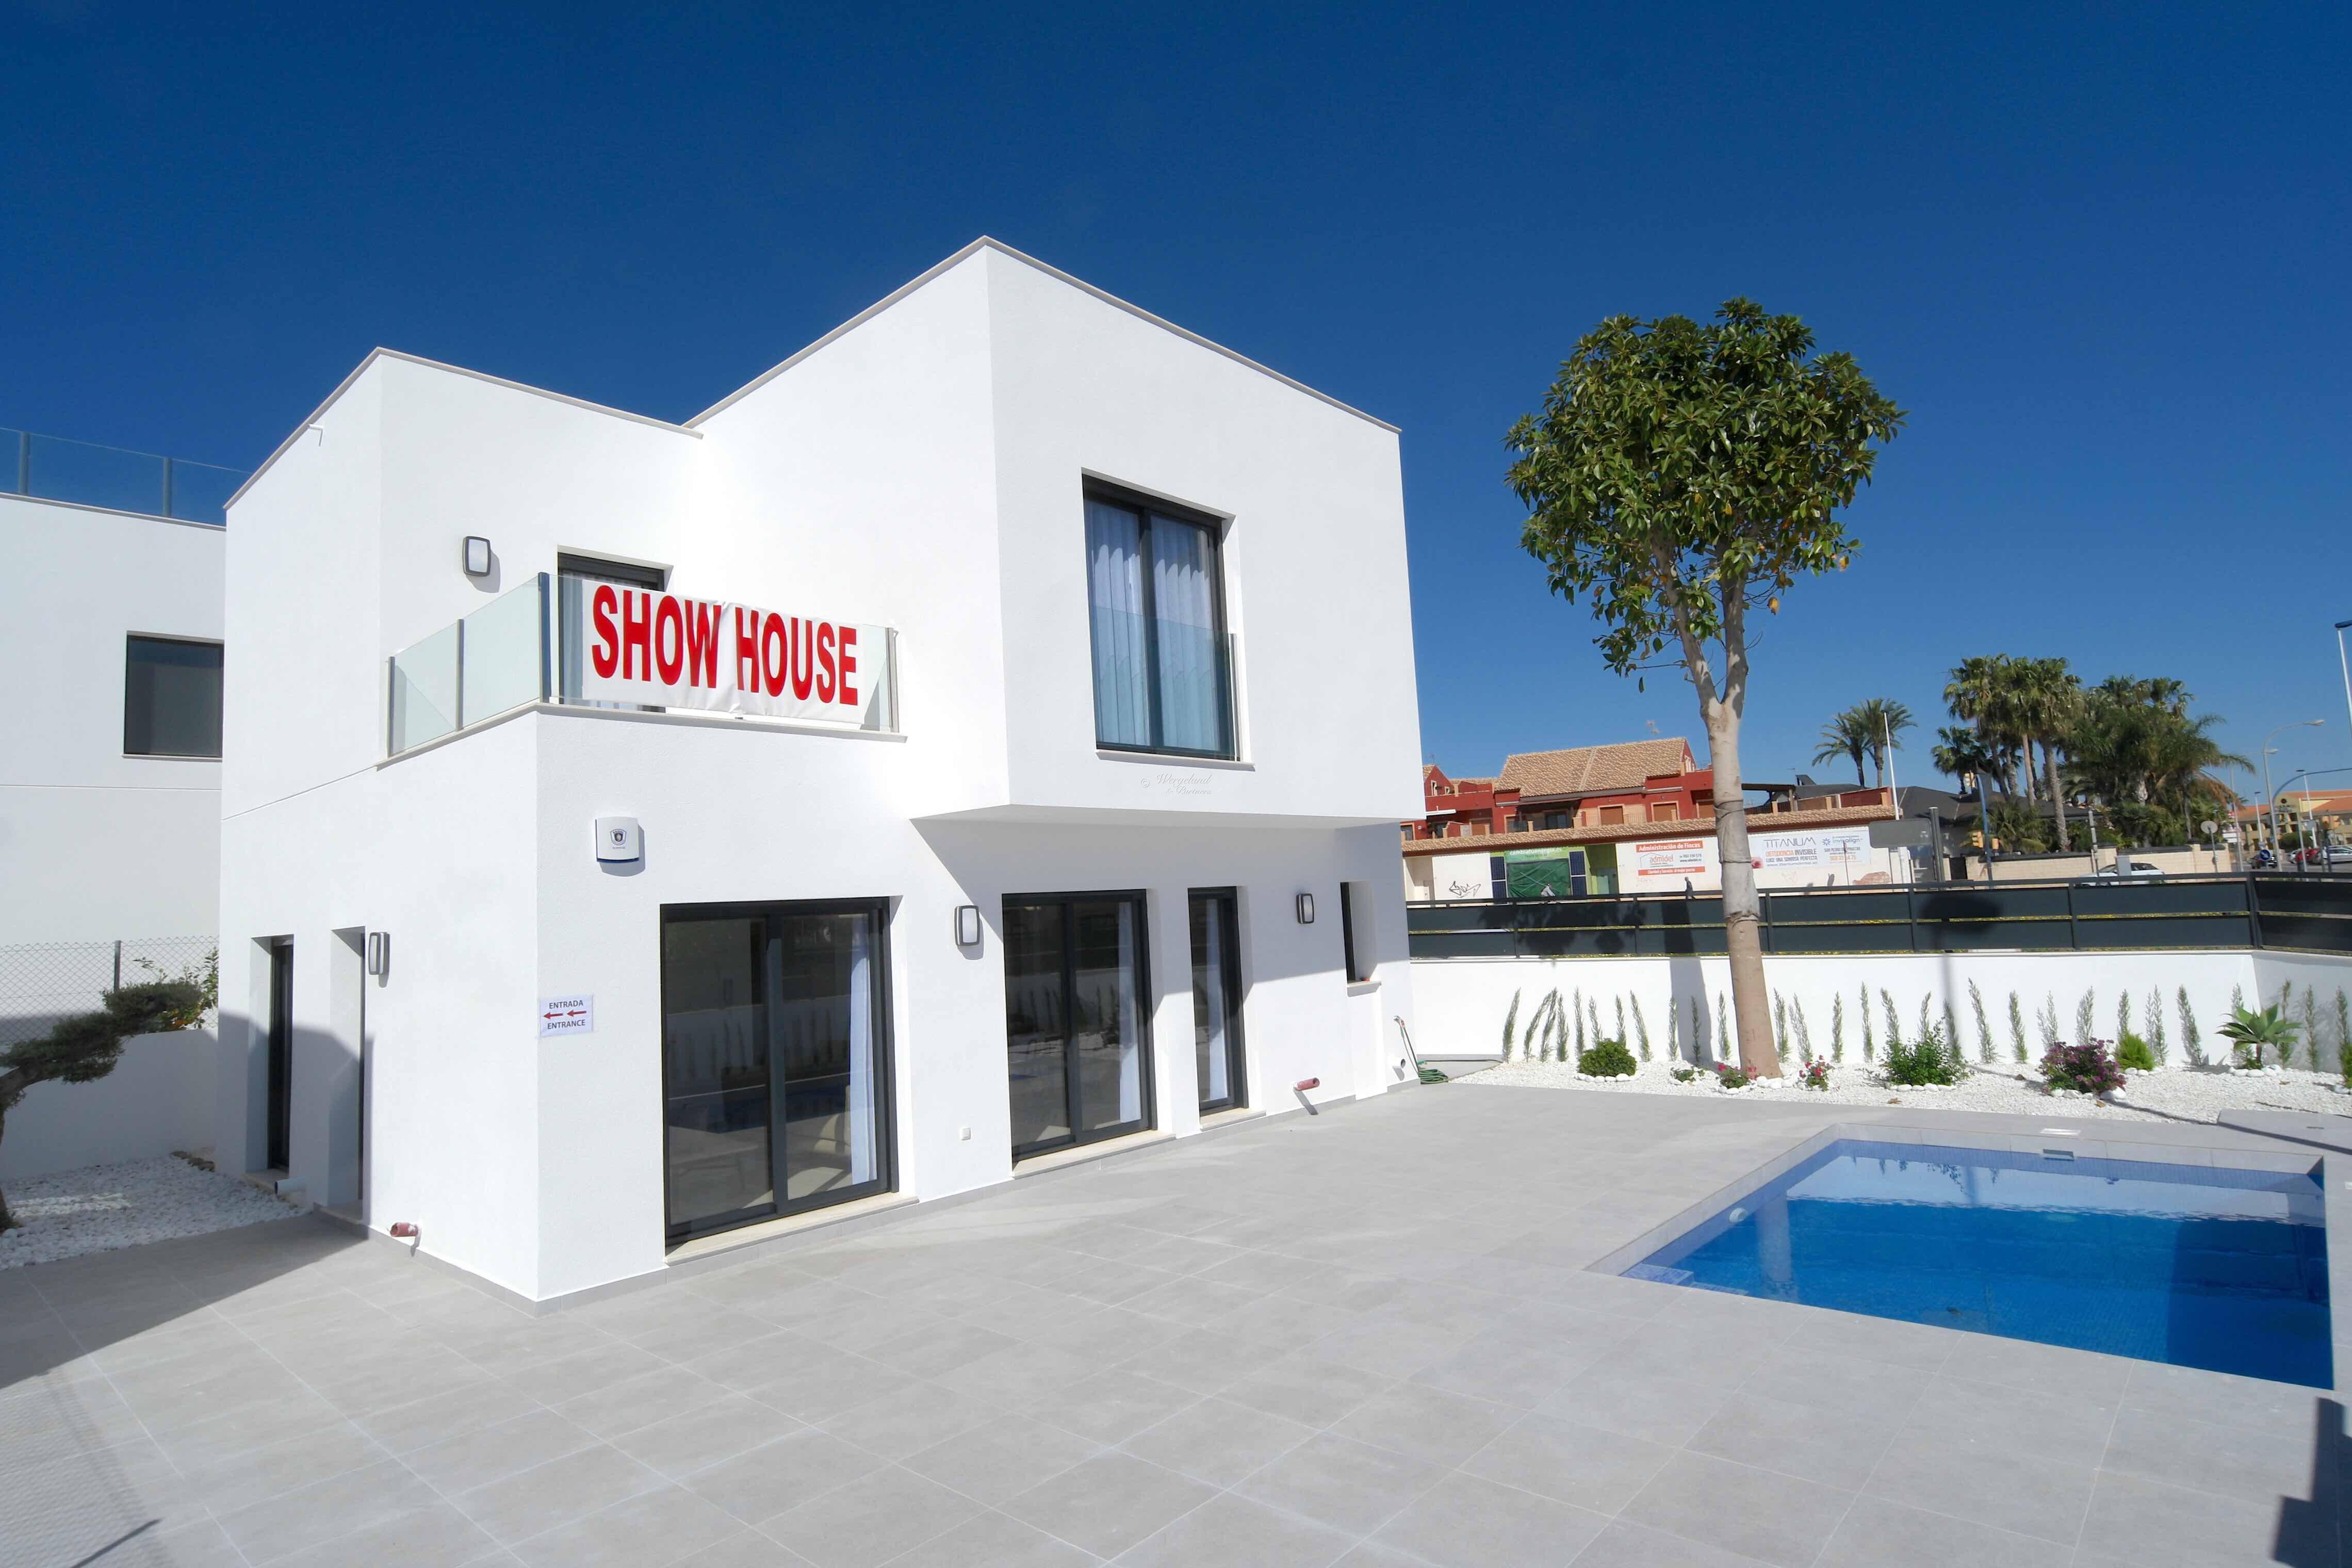 Kjøp Visningshuset! Ferdig møblert ny villa på hjørnetomt i San Pedro del Pinatar MED TAKTERRASSE. Innflyttingsklar [EPVE1]